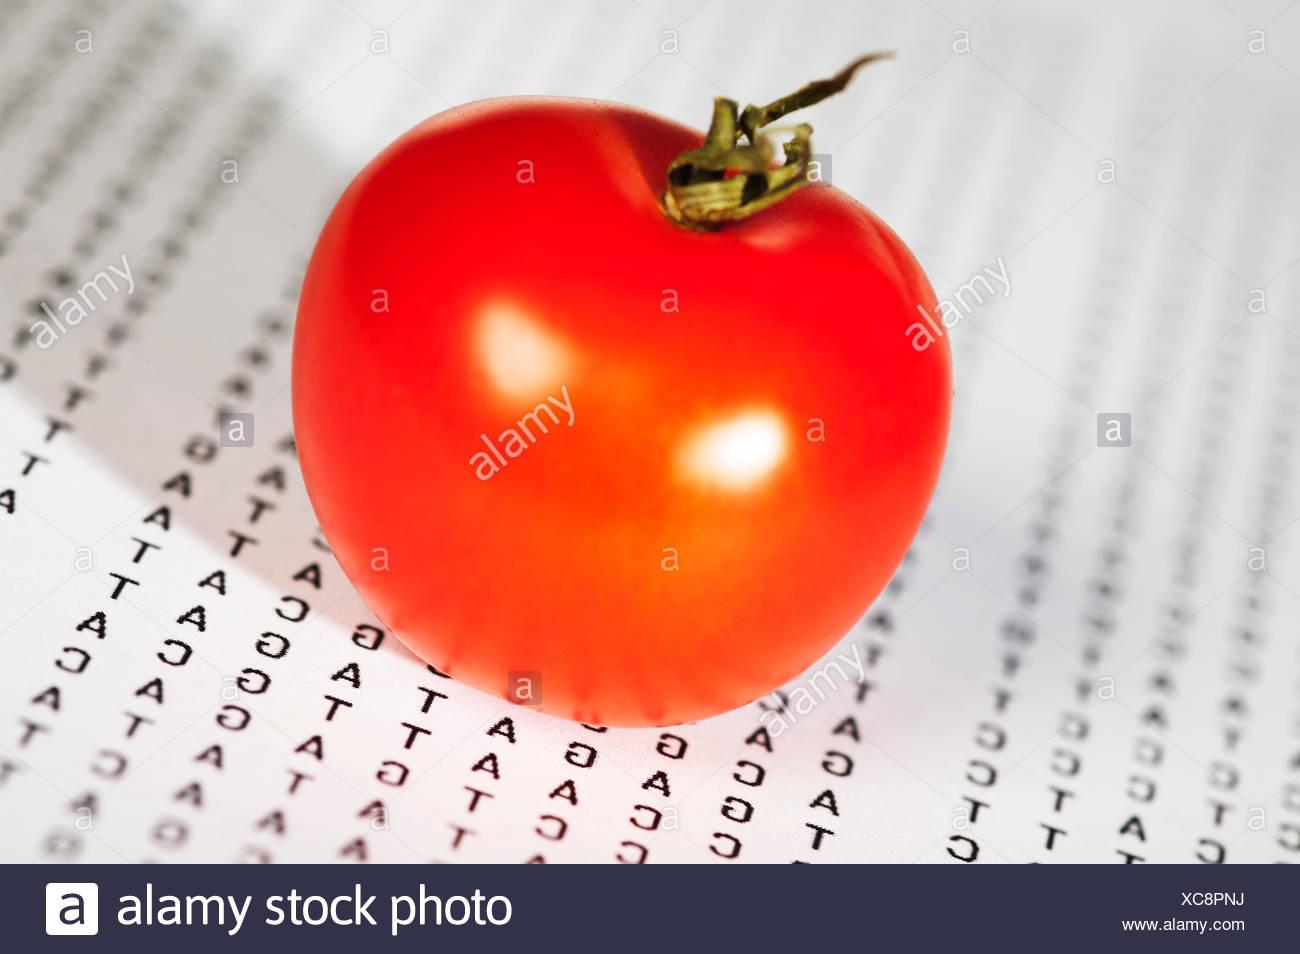 genetically modified food - Stock Image